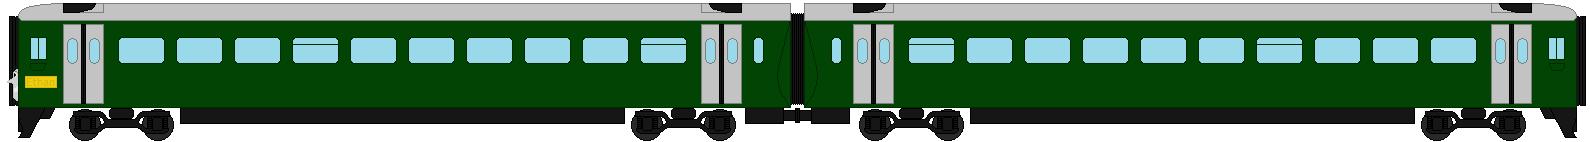 Ethan the GWR Class 158 by trainnerdFromDenmark